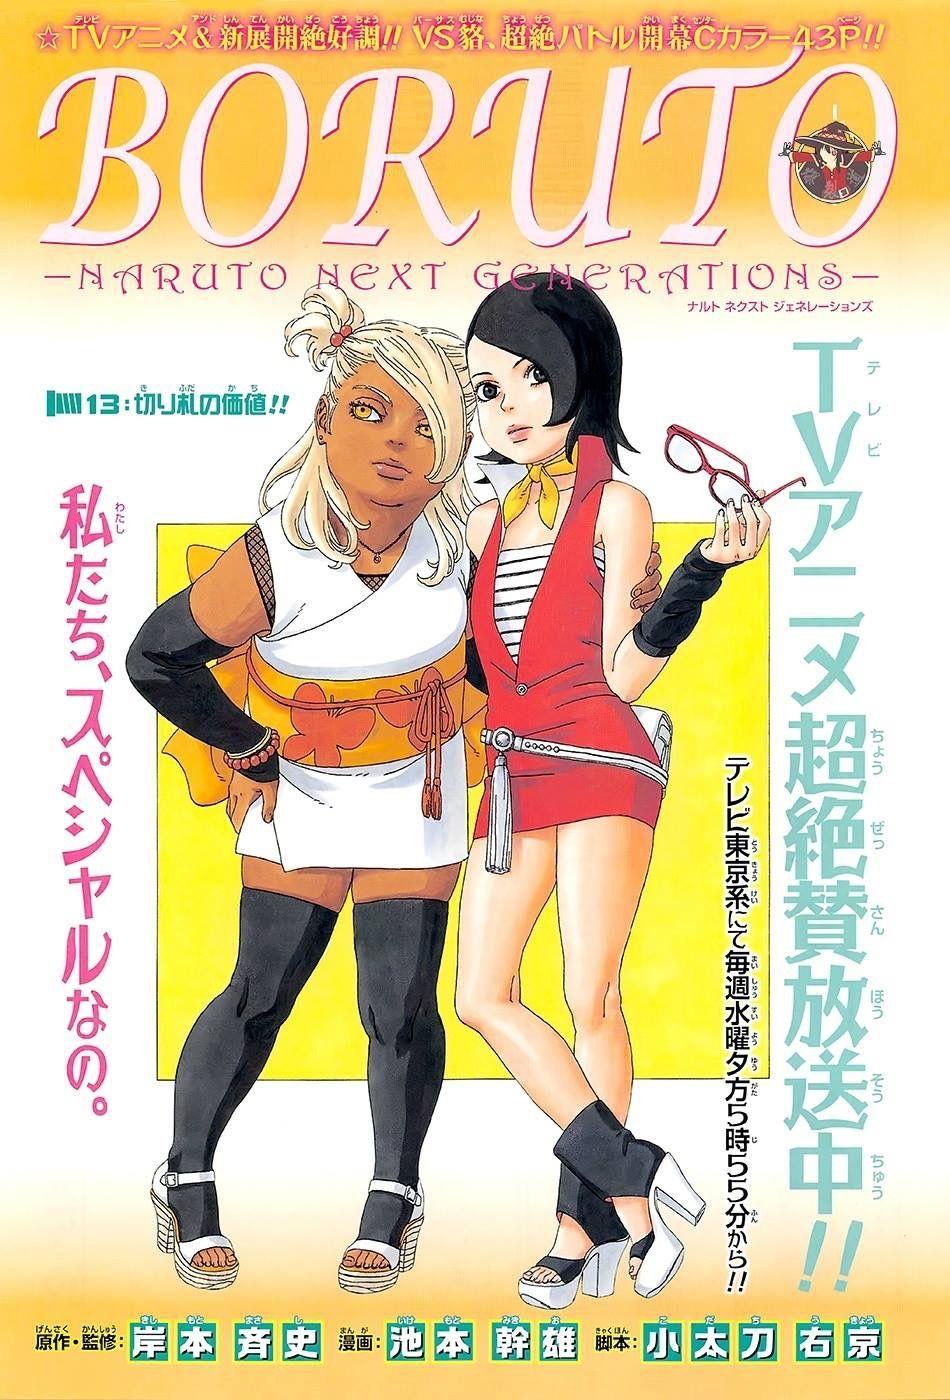 Pin by brina mooloo on Mas Anime Boruto, Naruto, Boruto